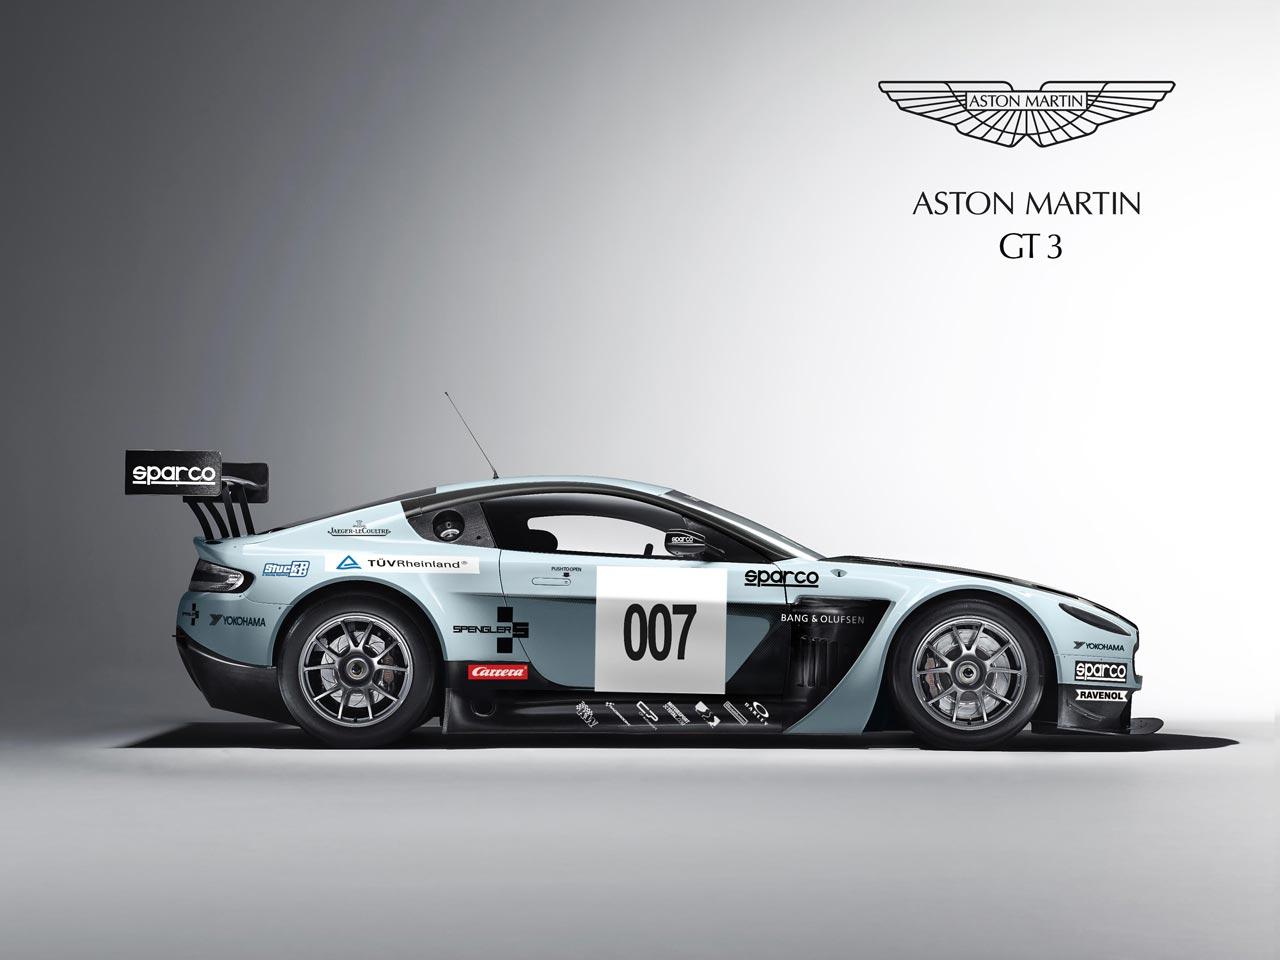 Aston Martin endurance racer